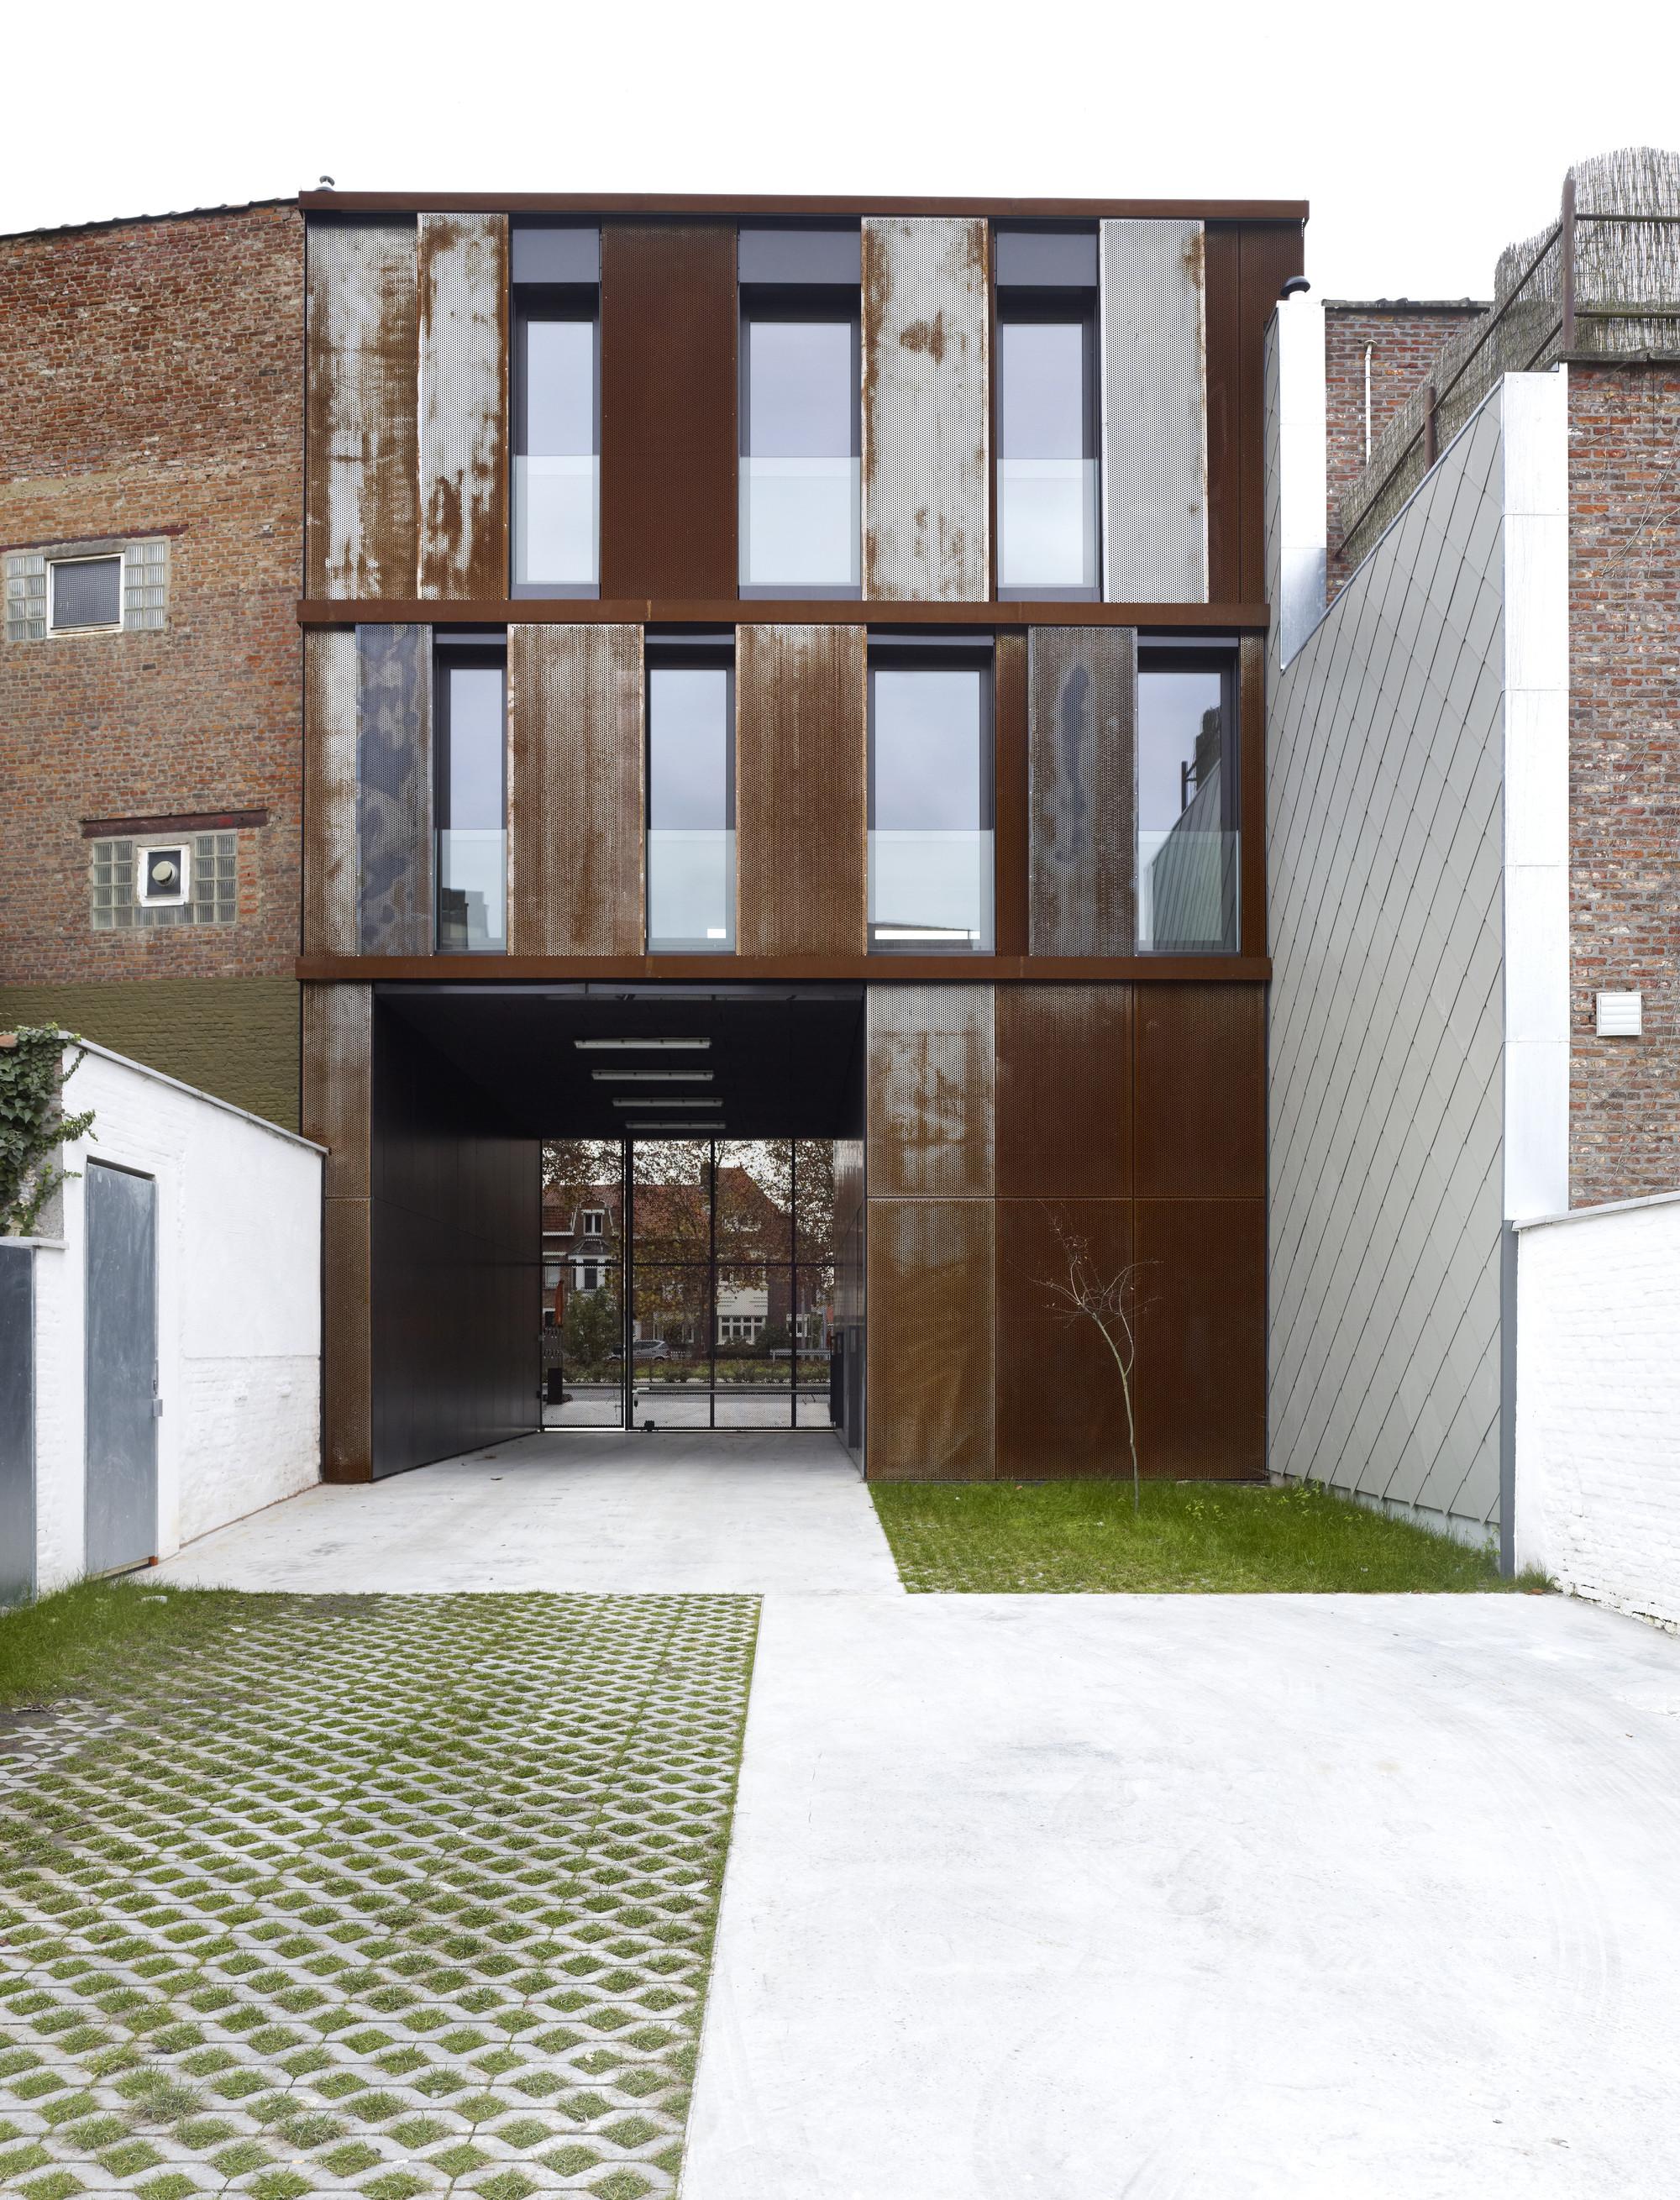 Apartments BUSO / dmvA Architecten